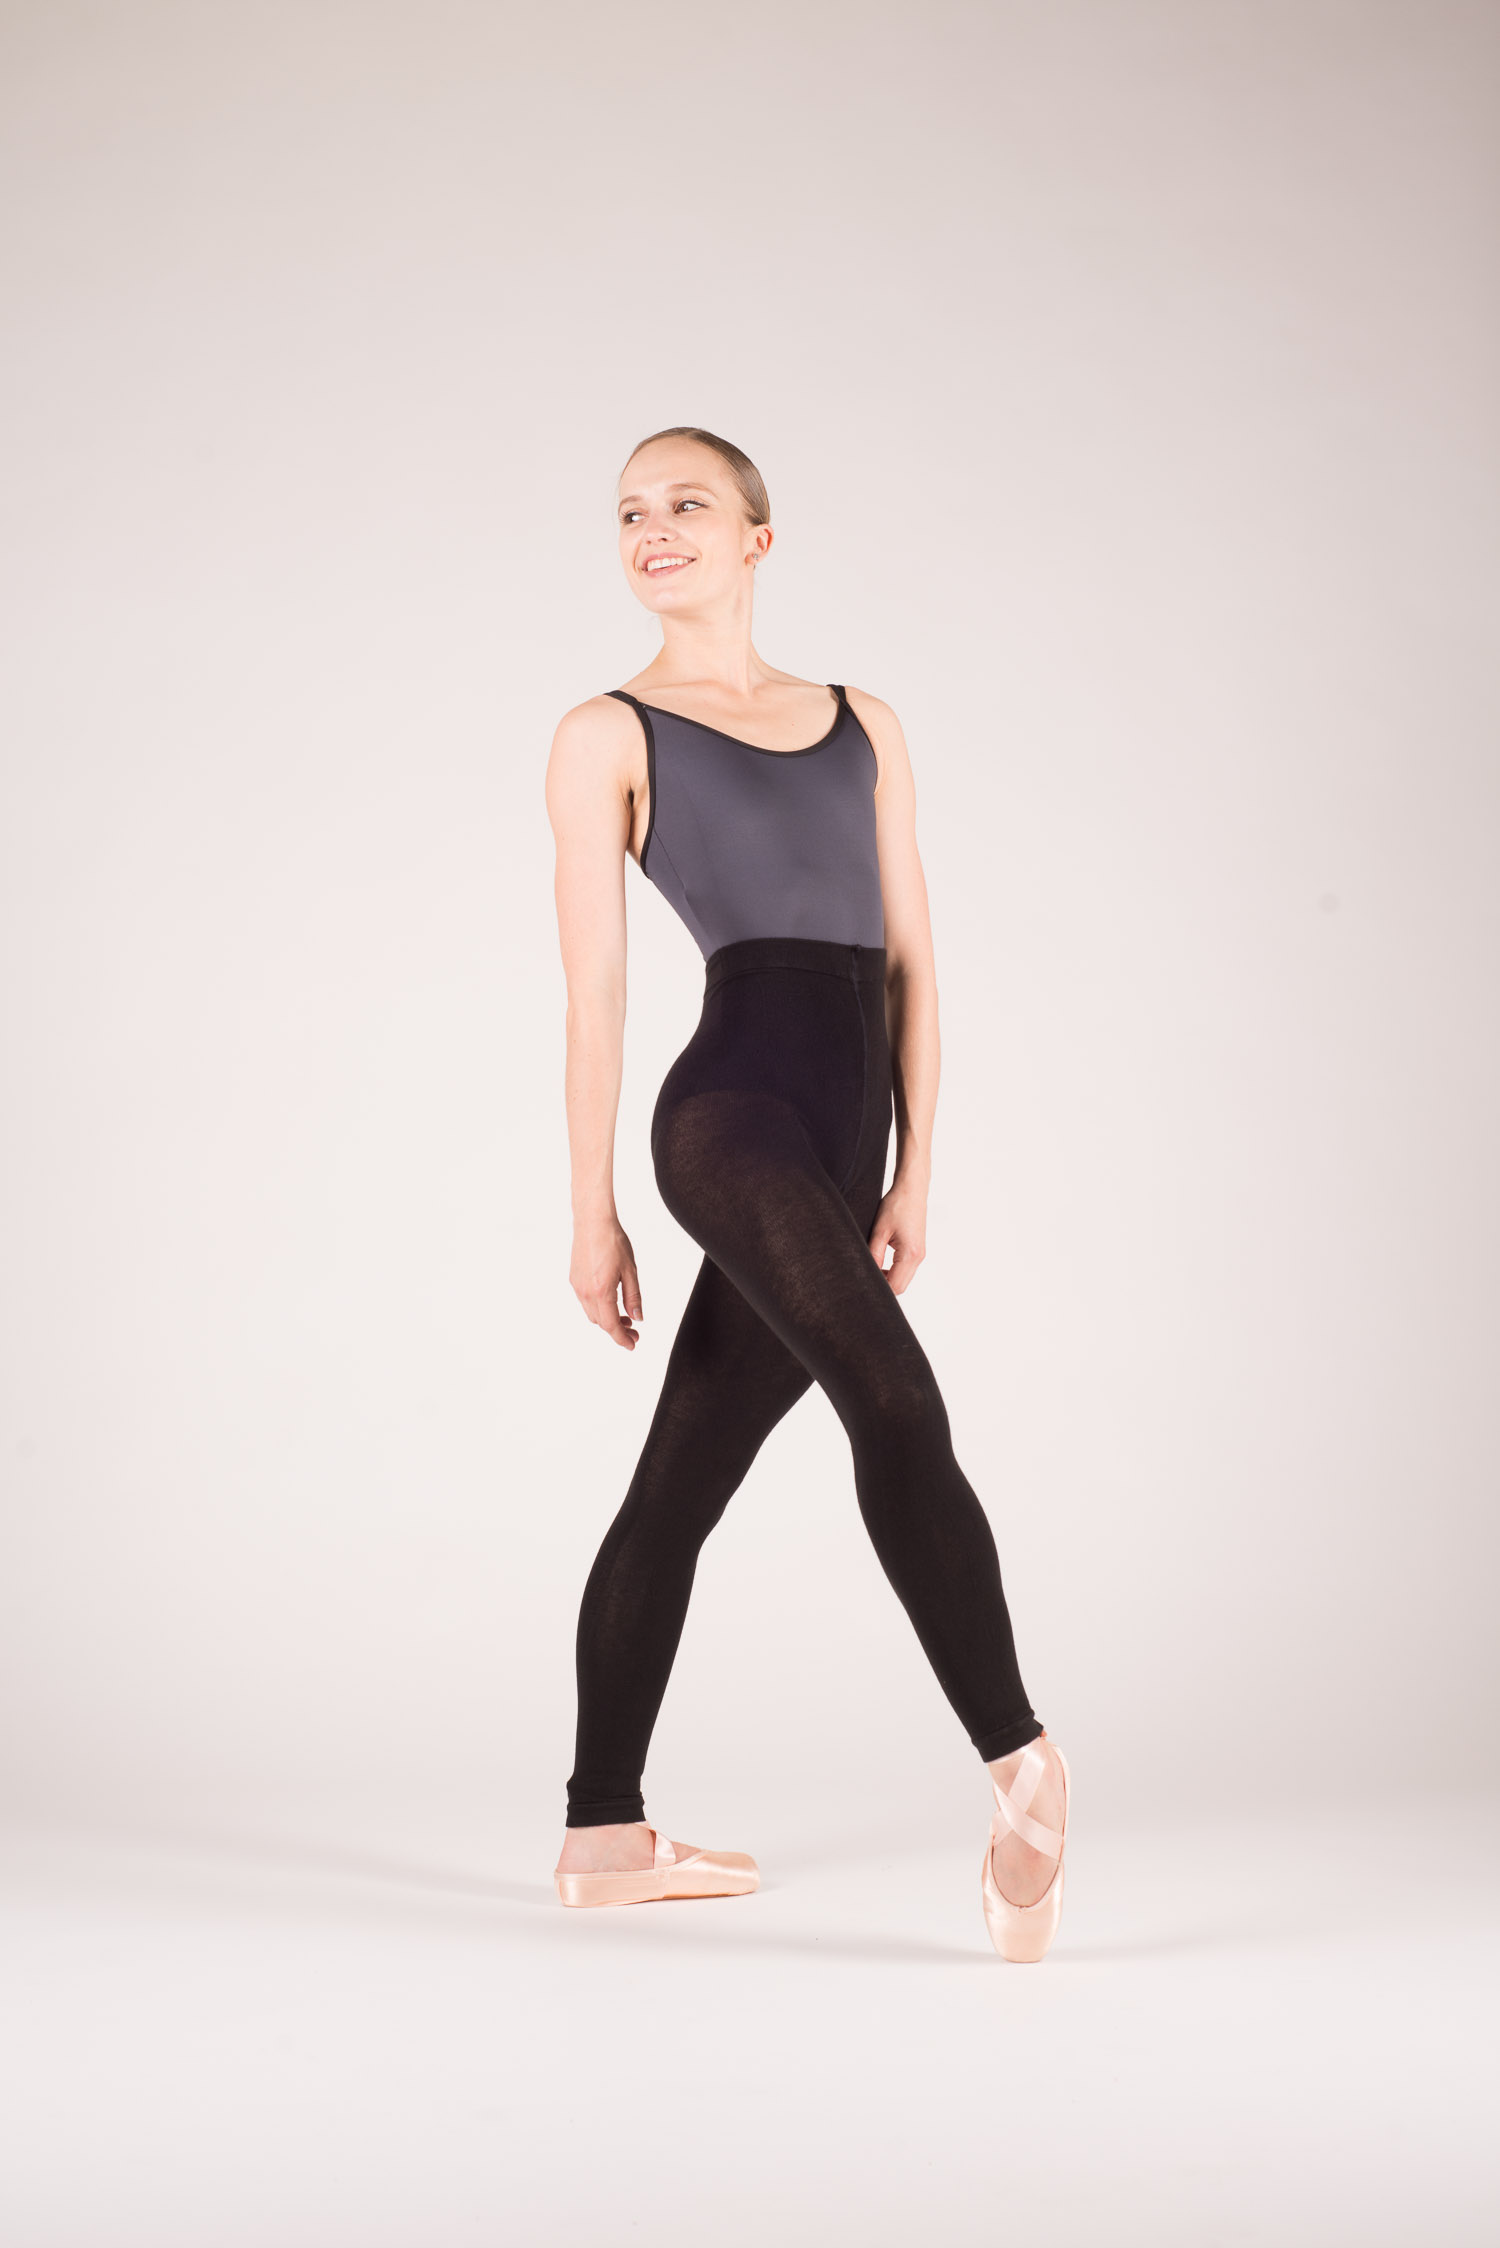 Collant d échauffement danse femme - Mademoiselle danse 3a99fa5b1f2